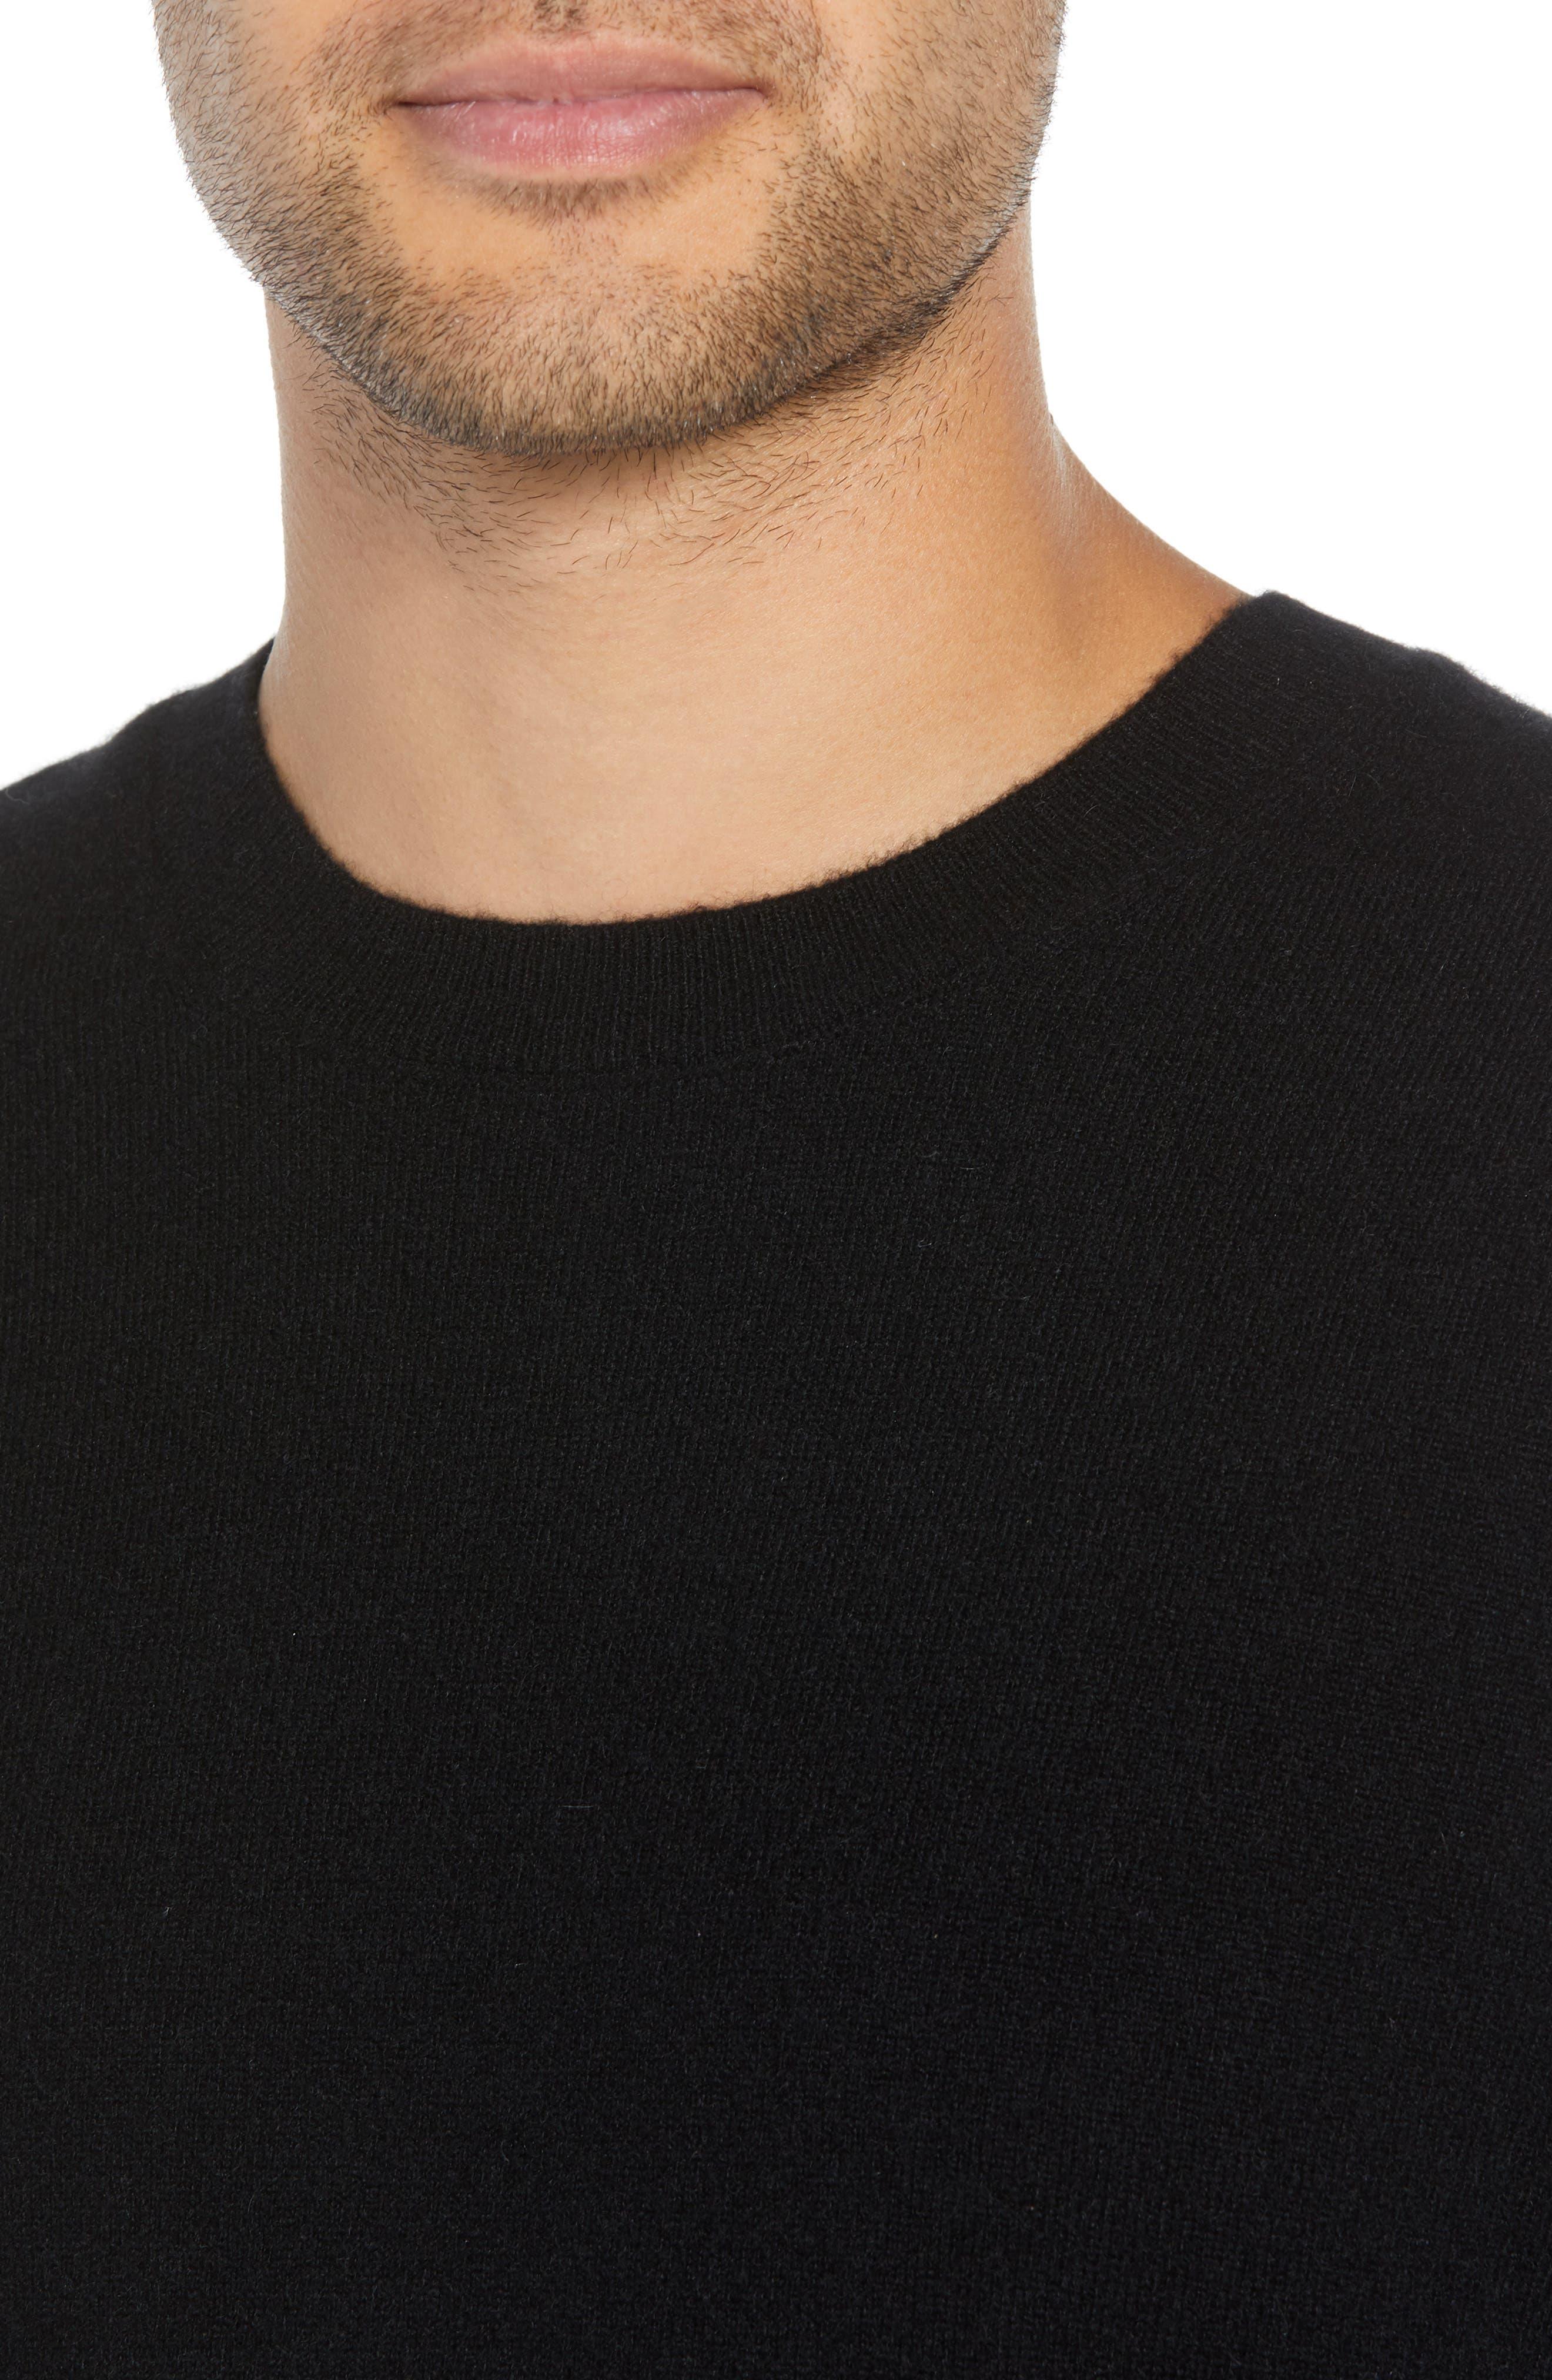 Regular Fit Cashmere Sweater,                             Alternate thumbnail 4, color,                             BLACK